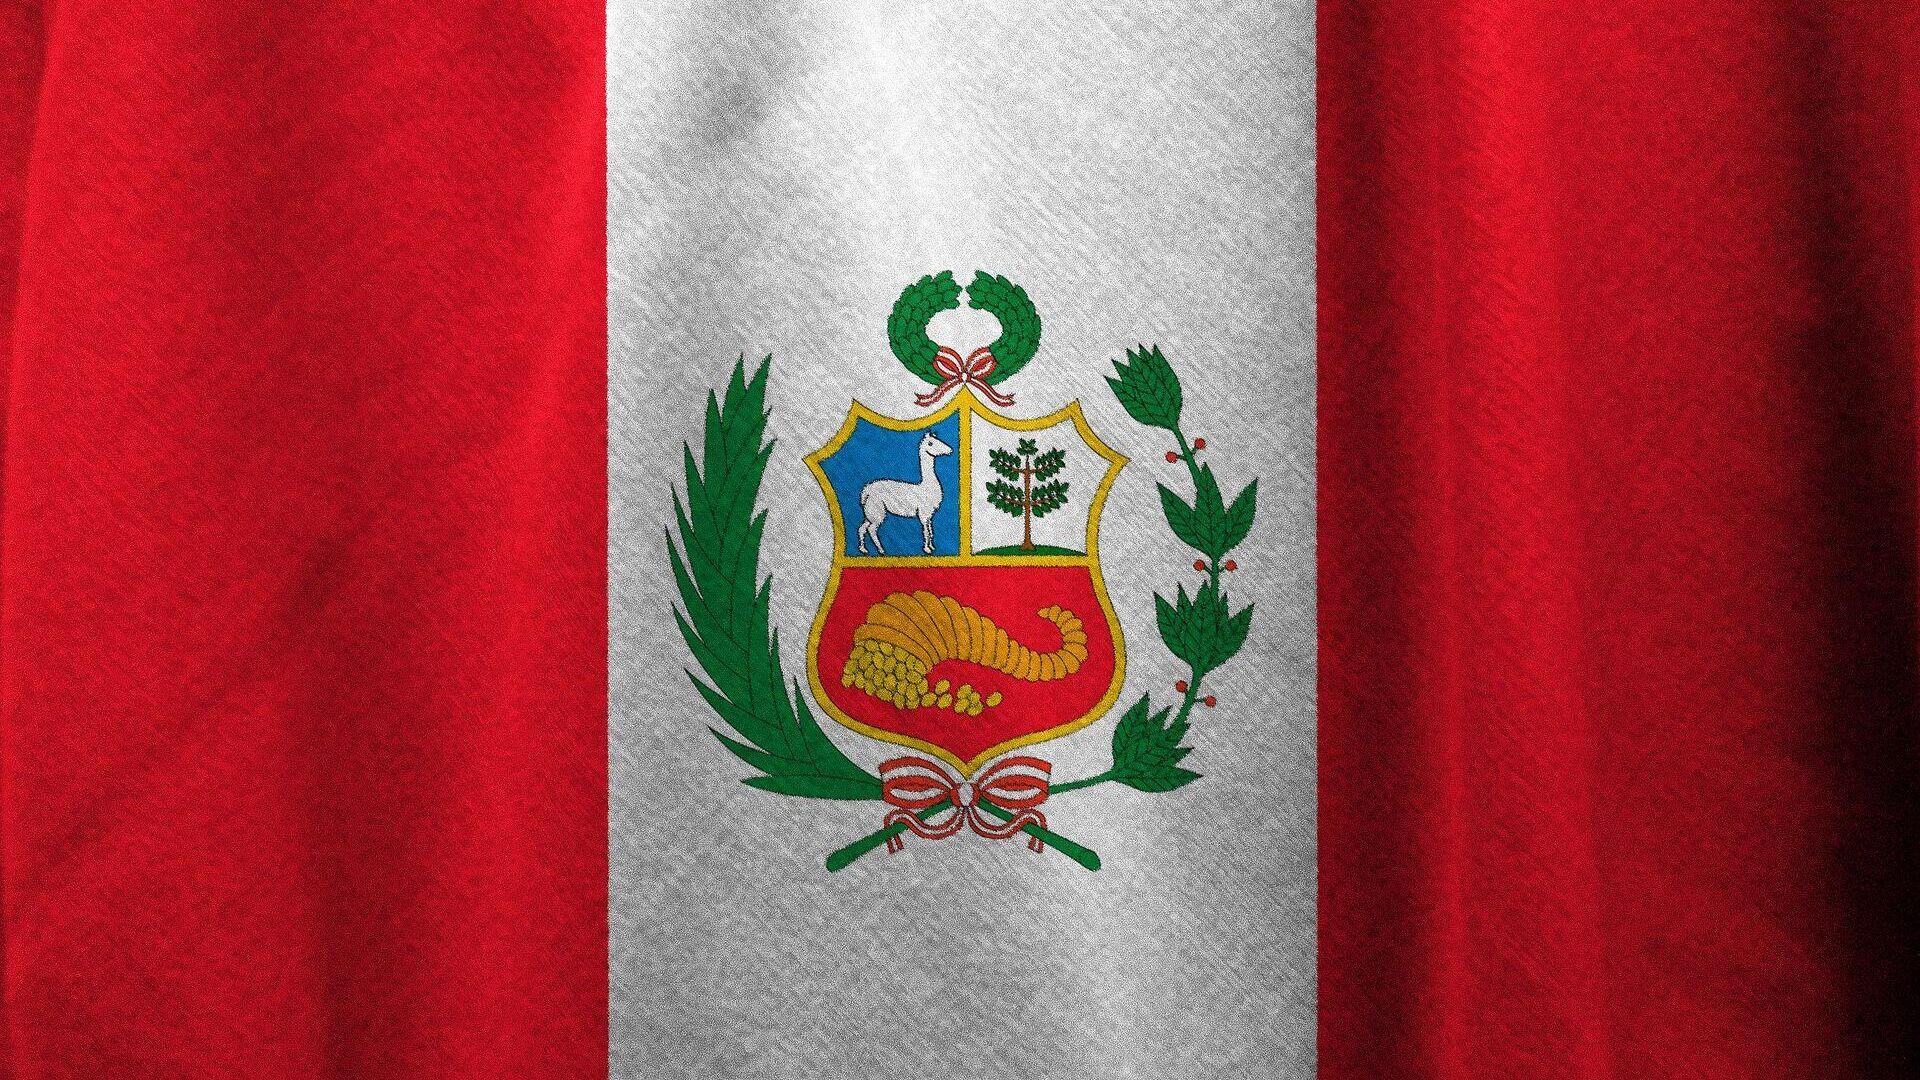 Bandera de Perú. Imagen referencial - Sputnik Mundo, 1920, 06.10.2021